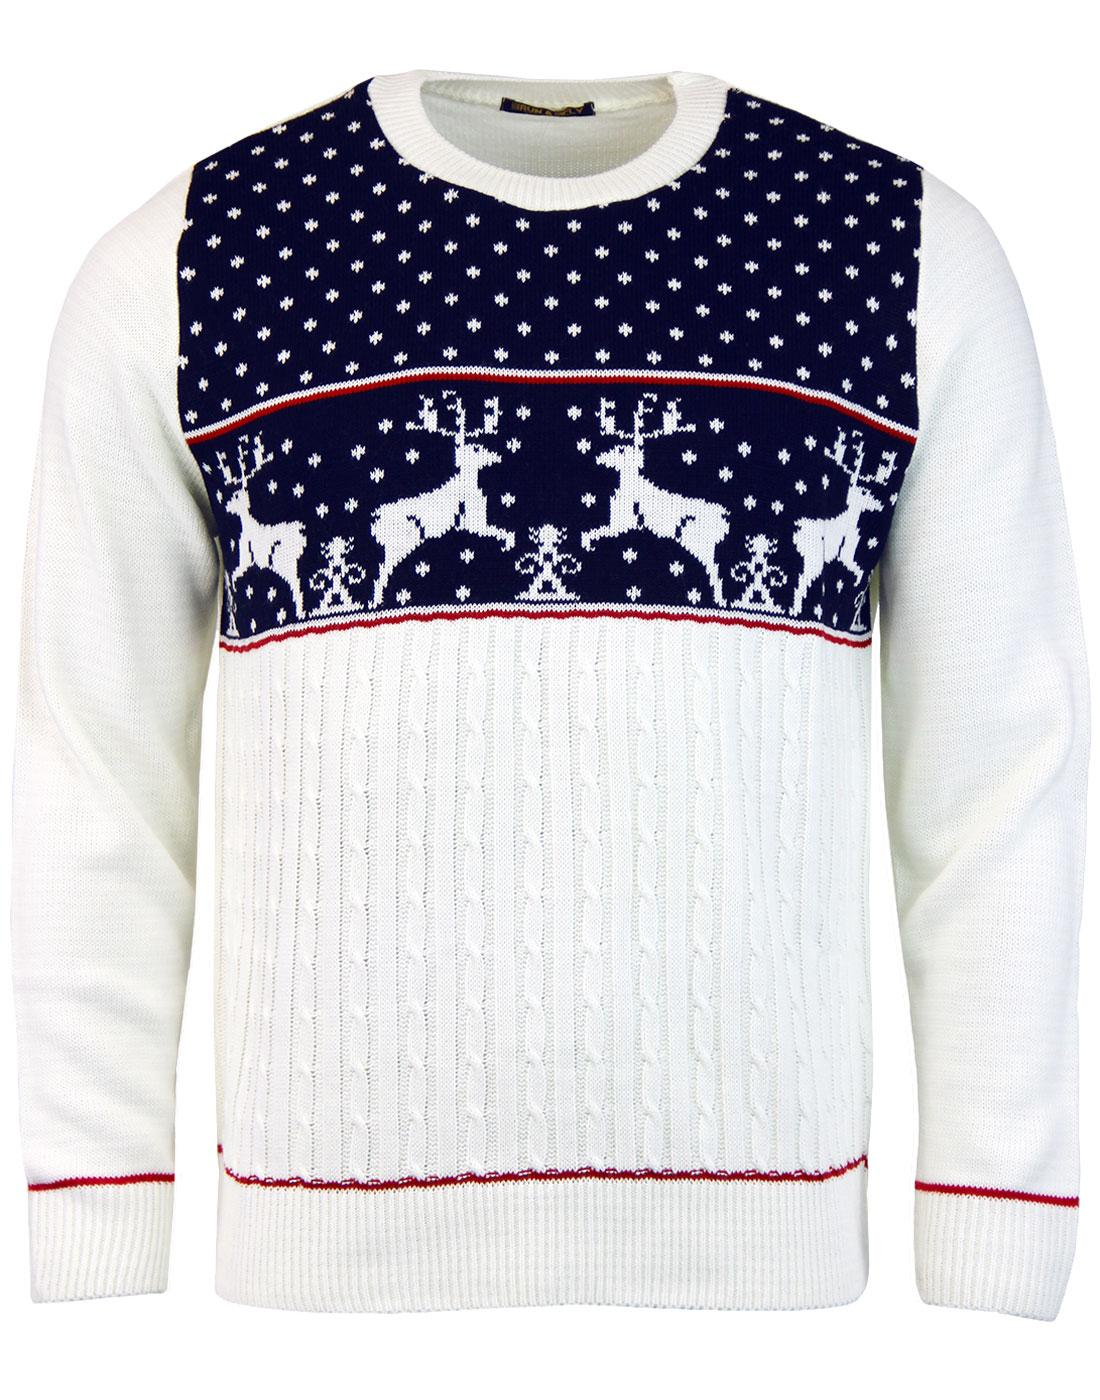 Reindeer Retro Christmas Jumper in Navy   Retro Xmas Sweaters